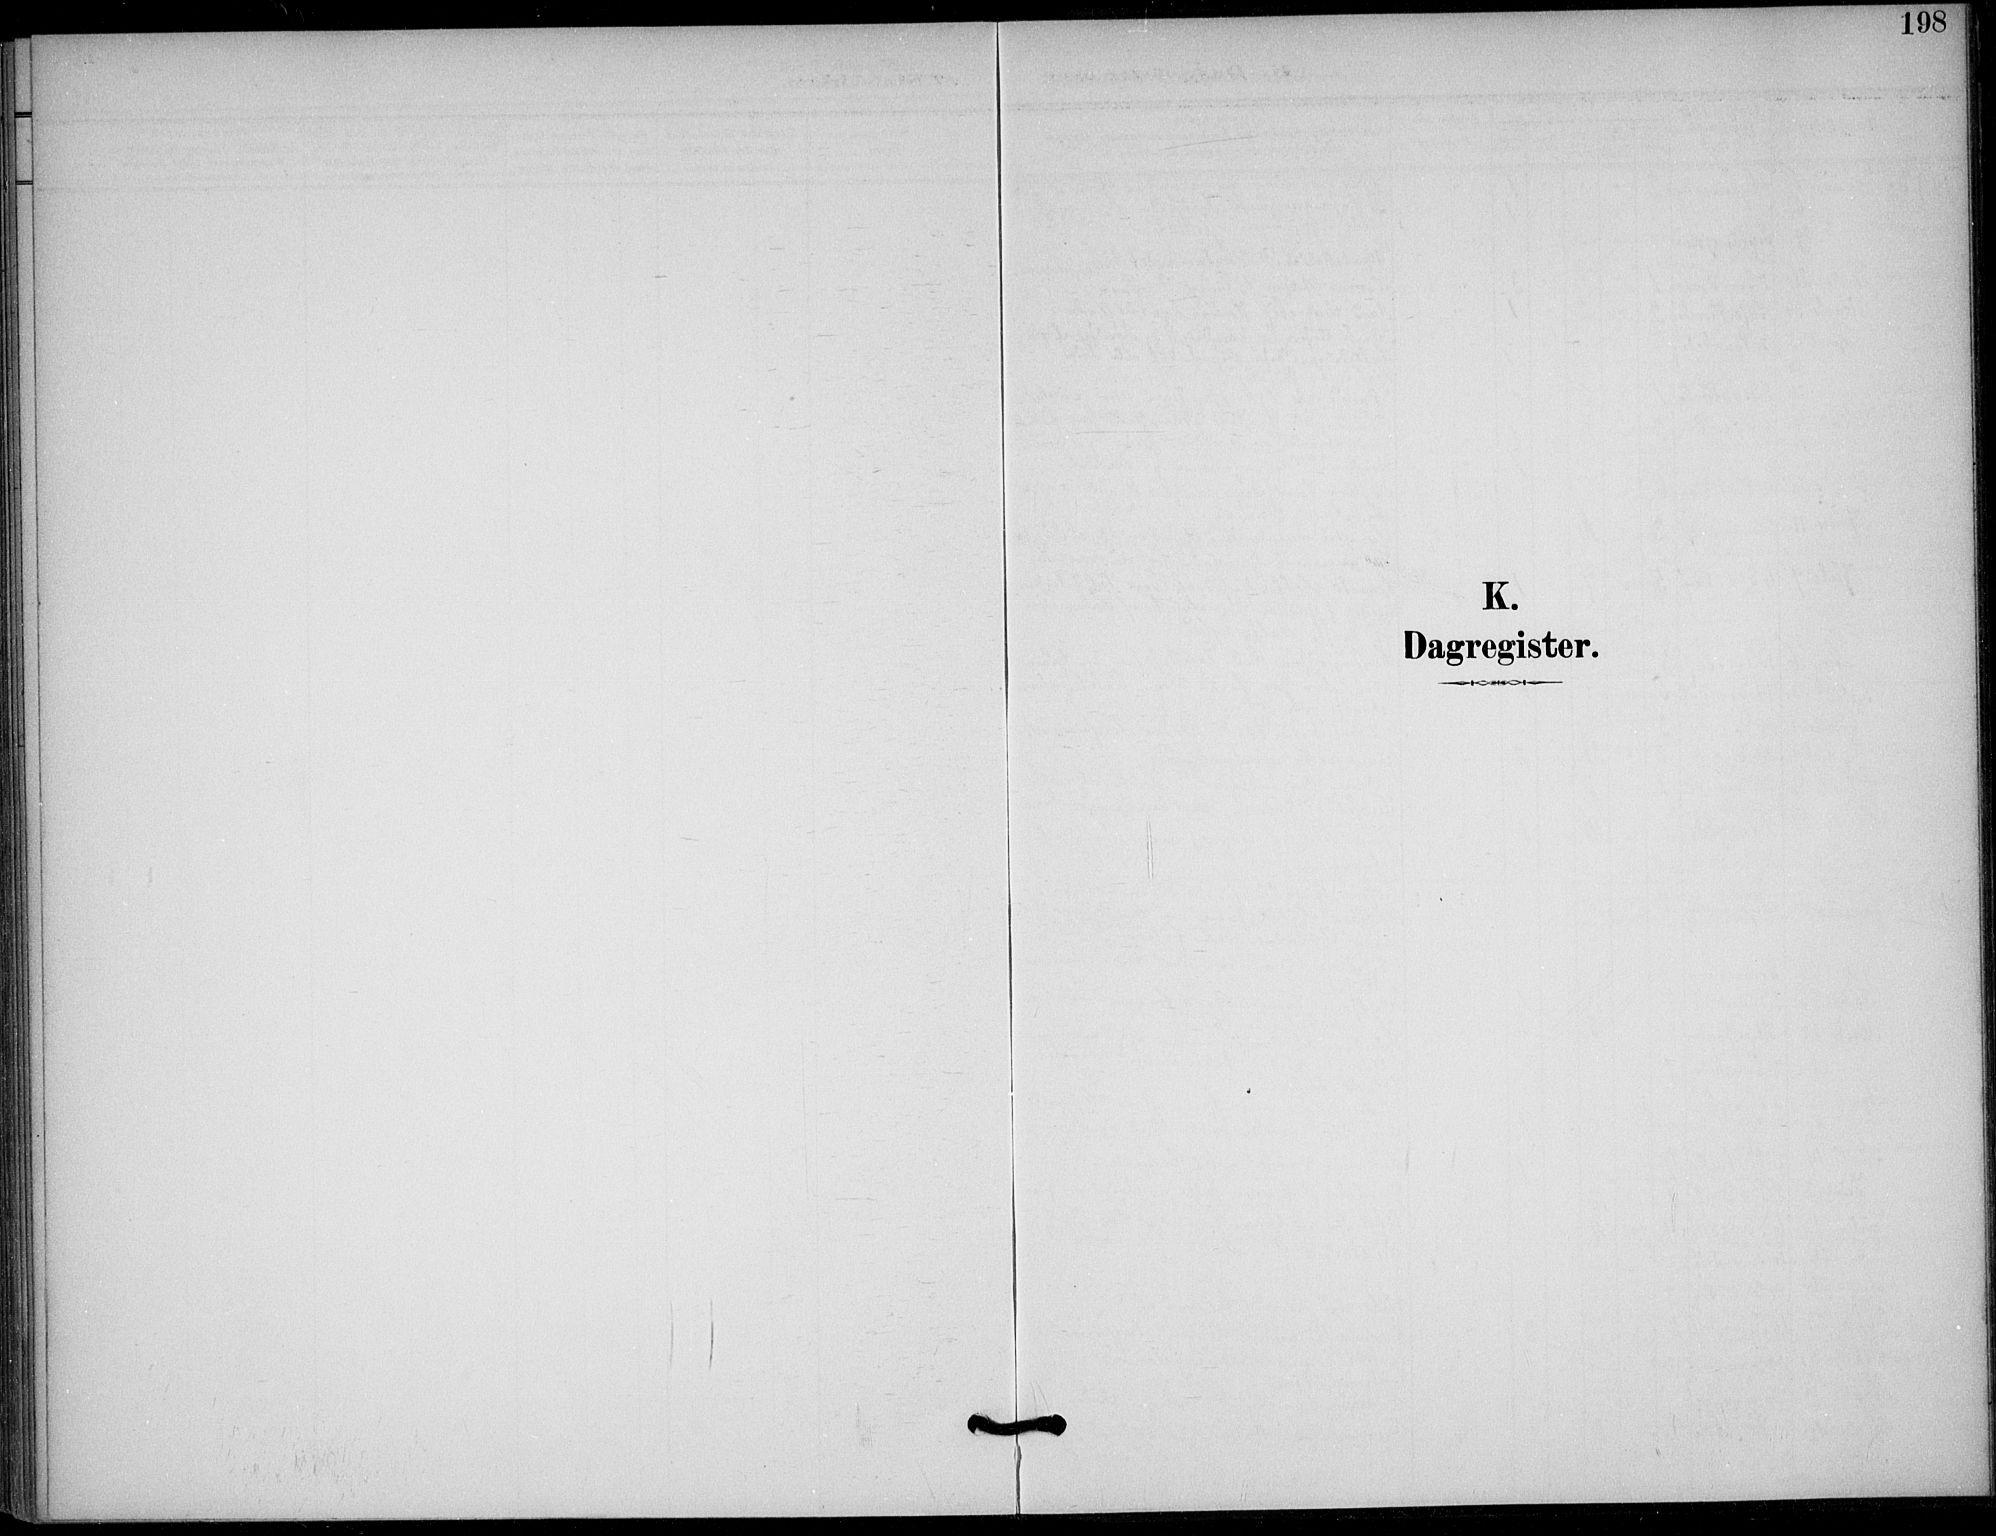 SAKO, Solum kirkebøker, F/Fb/L0002: Ministerialbok nr. II 2, 1893-1901, s. 198